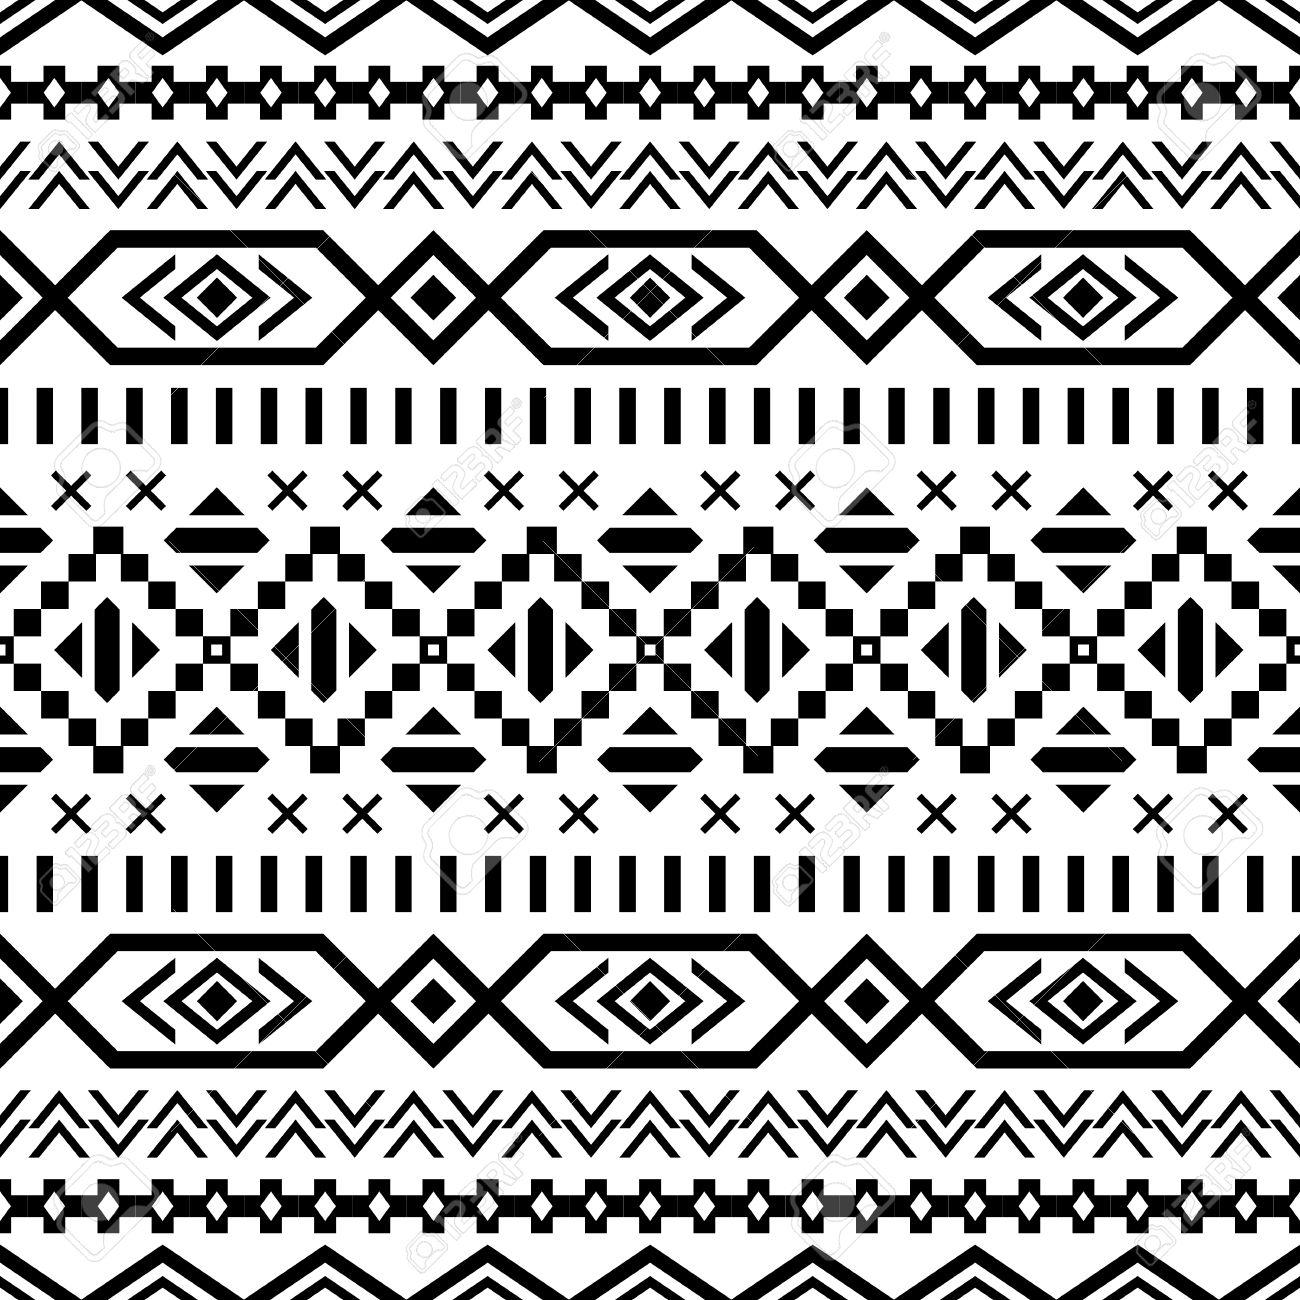 Aztec Black White Background Tribal Ethnic Navajo Print Modern